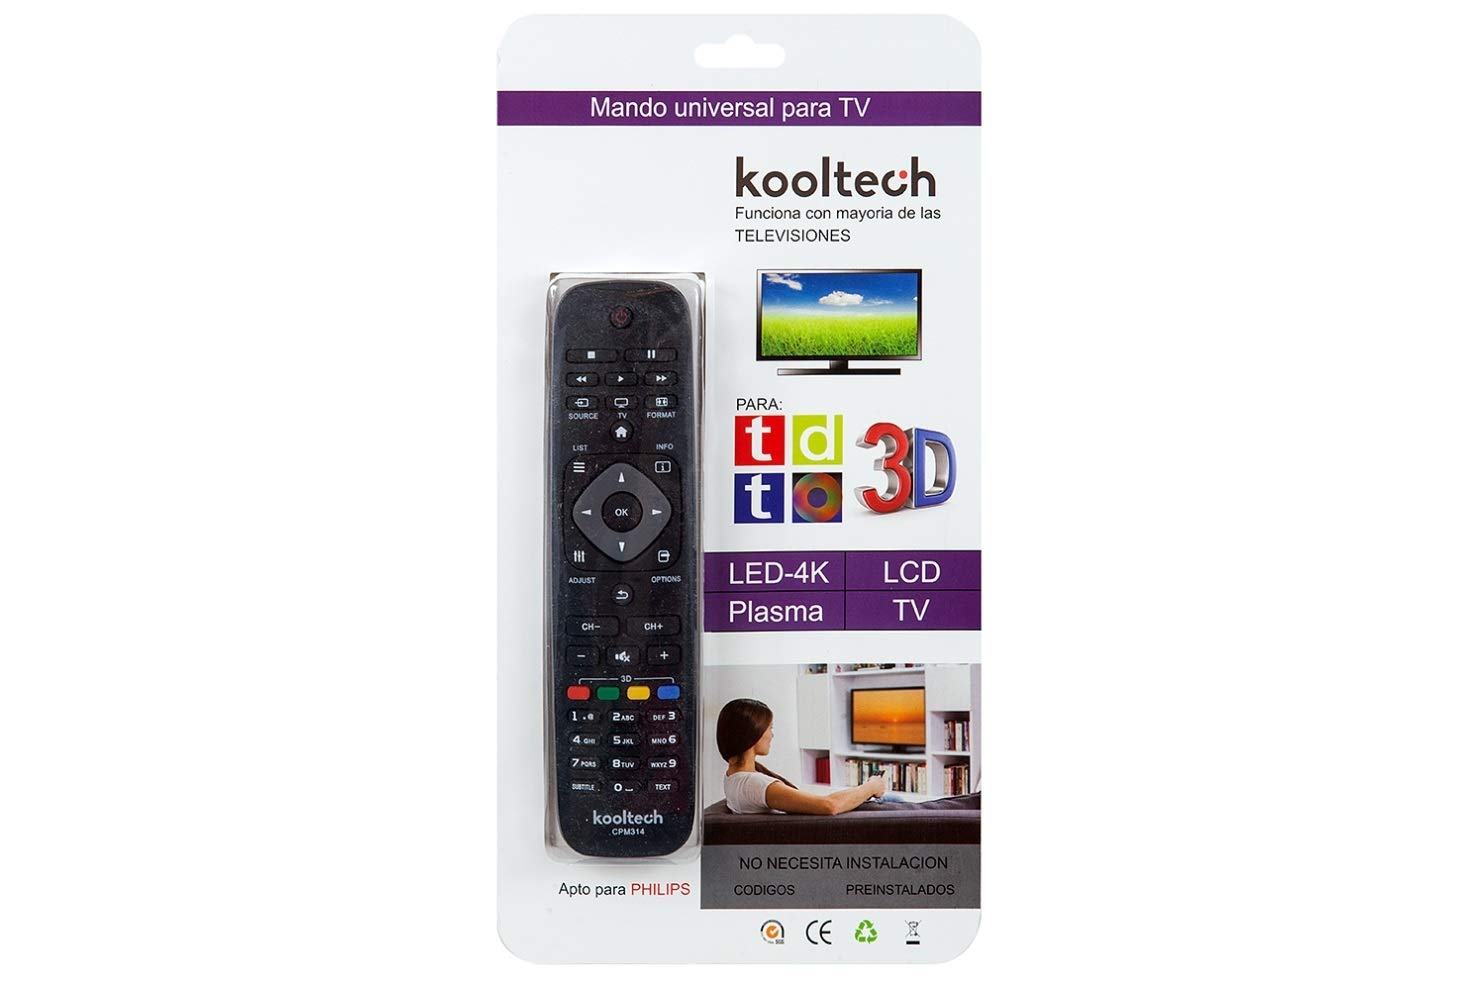 Kooltech 017225 Mando Universal Philips/100: Amazon.es: Electrónica